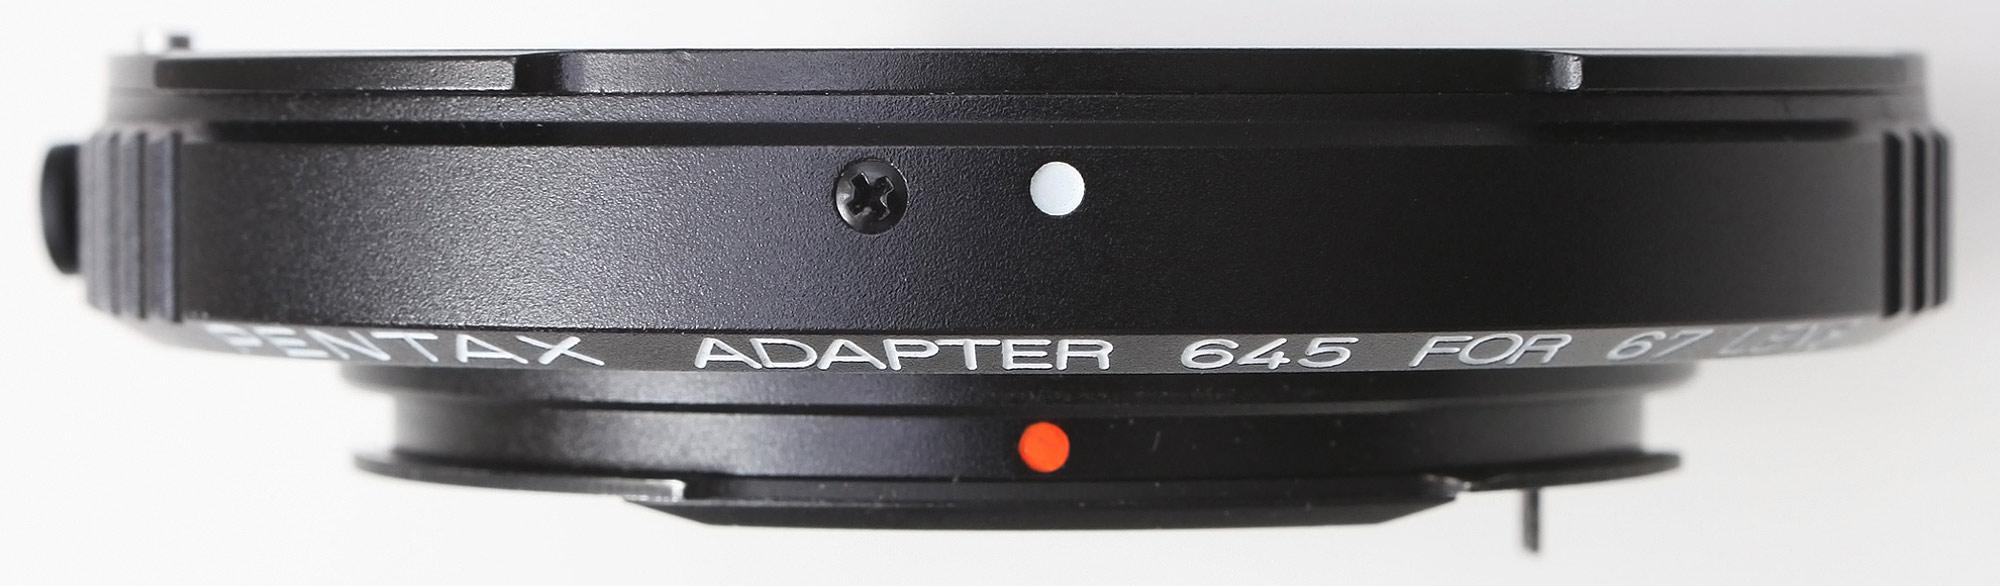 Pentax adapter 645 for 67 lens